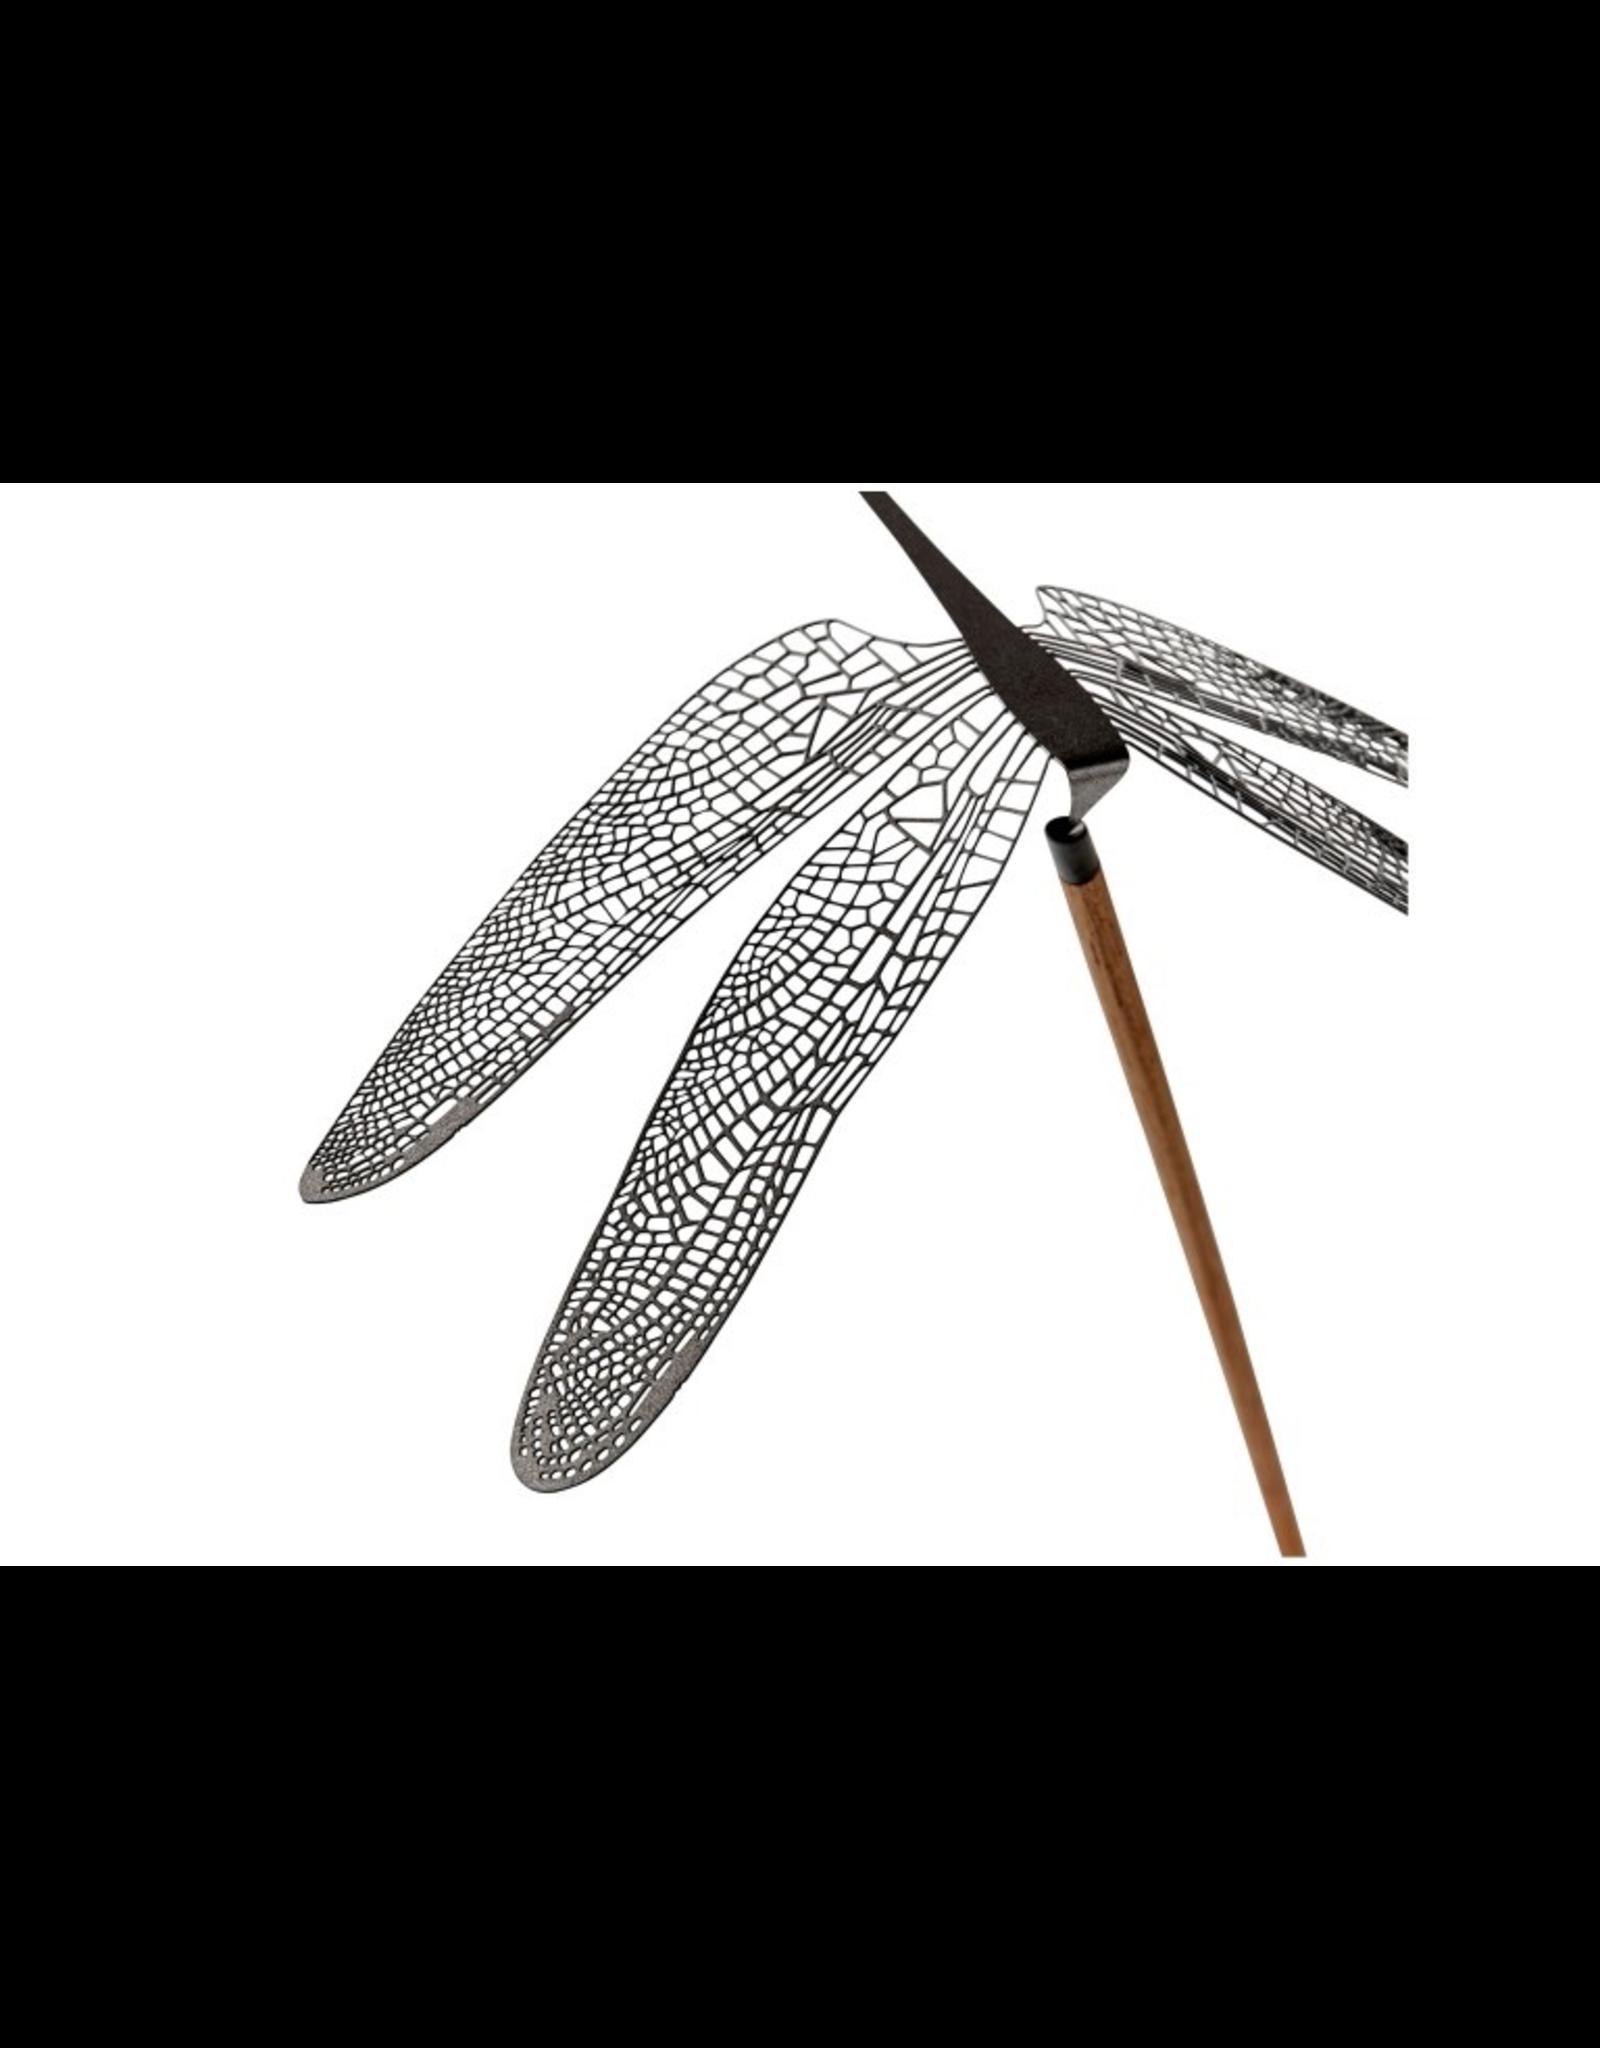 NAV Scandinavia Wonder Dragonfly 3pcs - Set S/M/L - Mixed